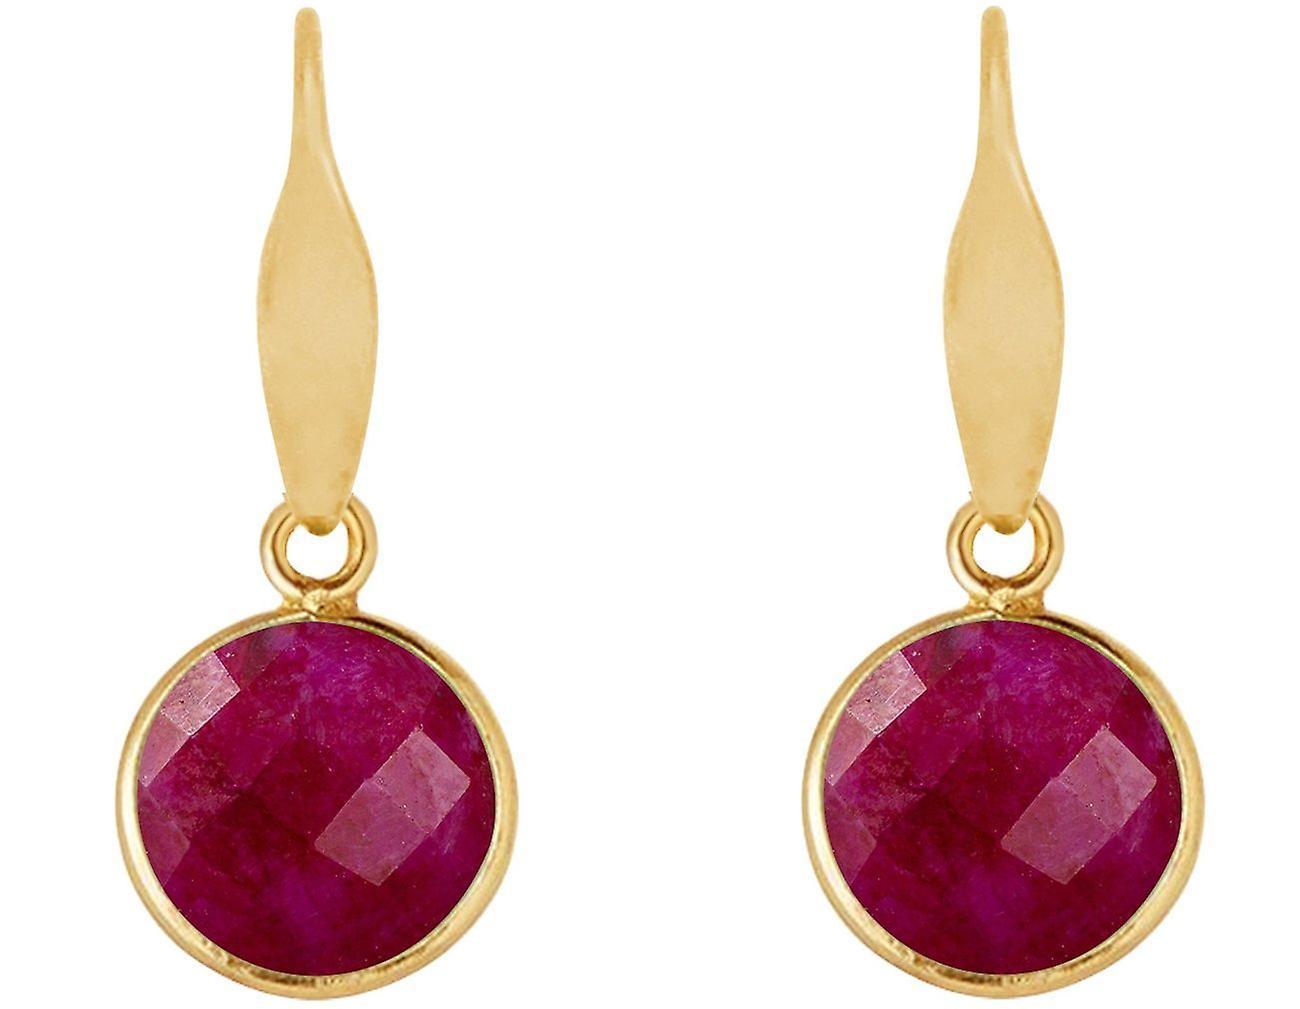 Gemshine Ohrringe rote Rubinen Edelstein Tropfen 925 Silber, vergoldet oder rose